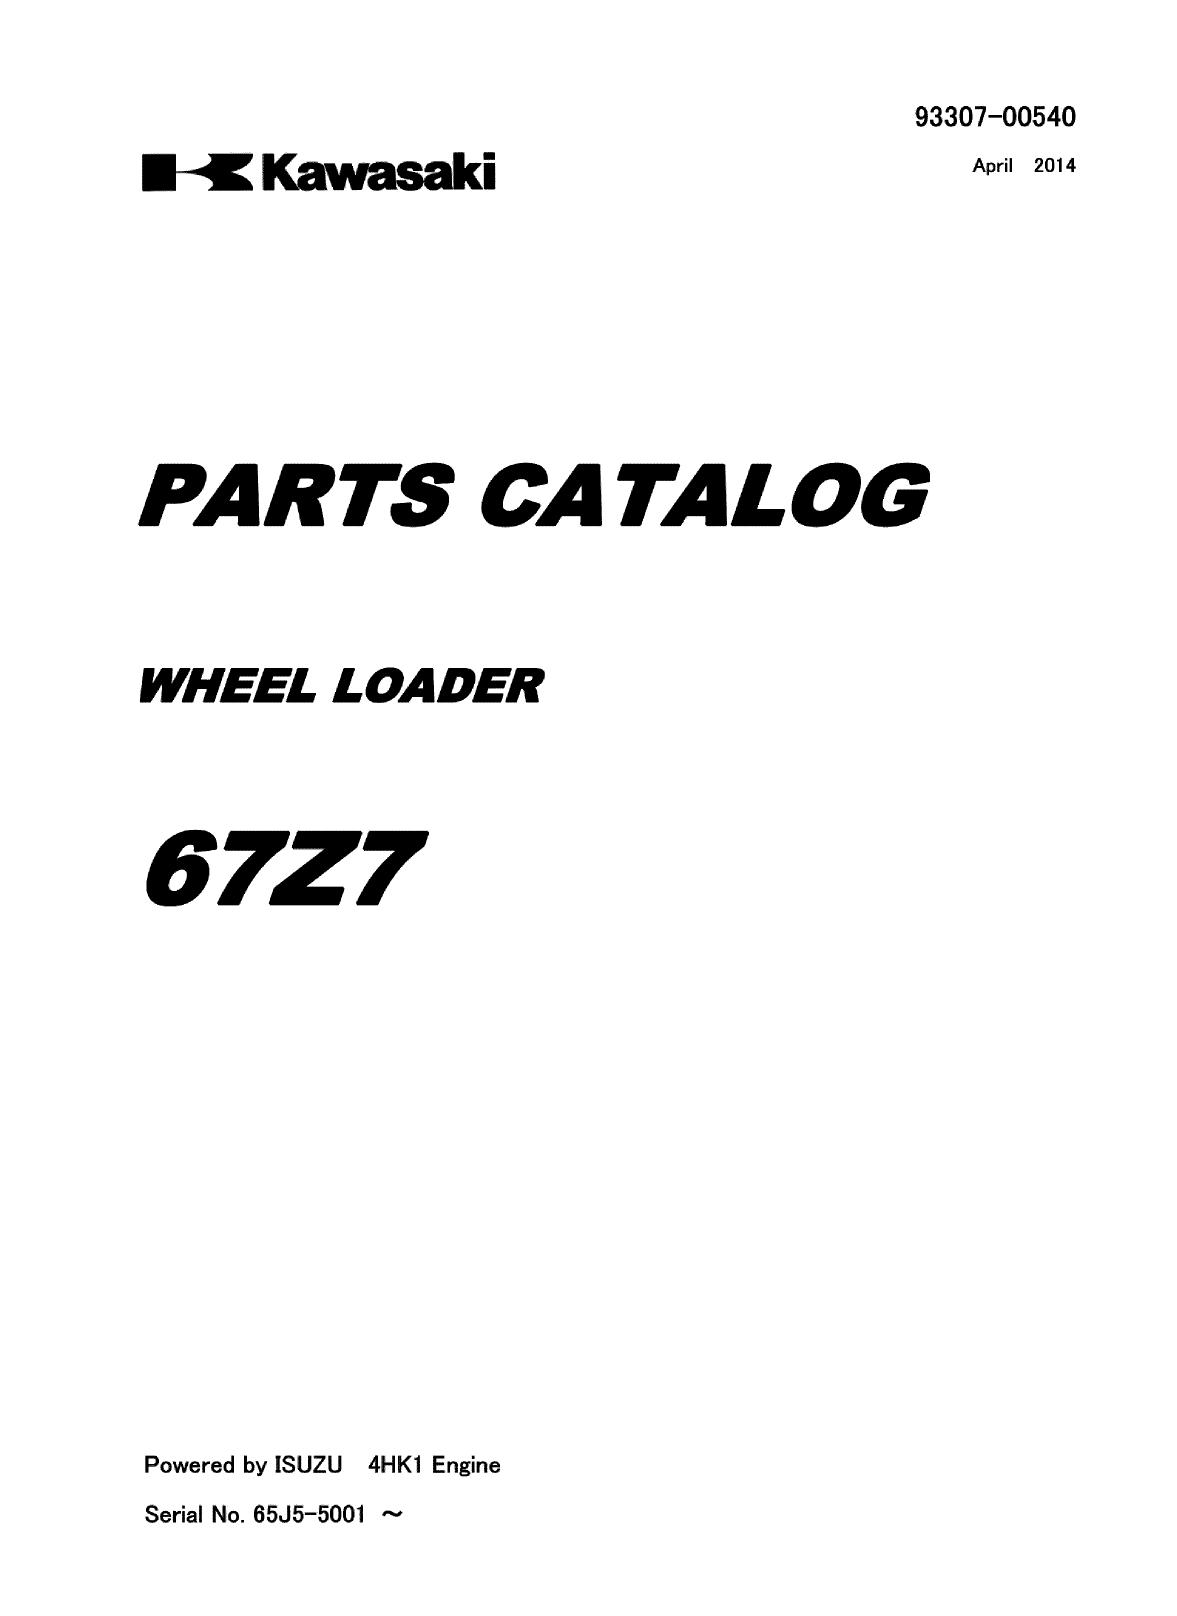 Kawasaki KCM 67Z7 Wheel Loader Parts Catalog   Garton Tractor   California    Kubota & New Holland Tractors Equipment